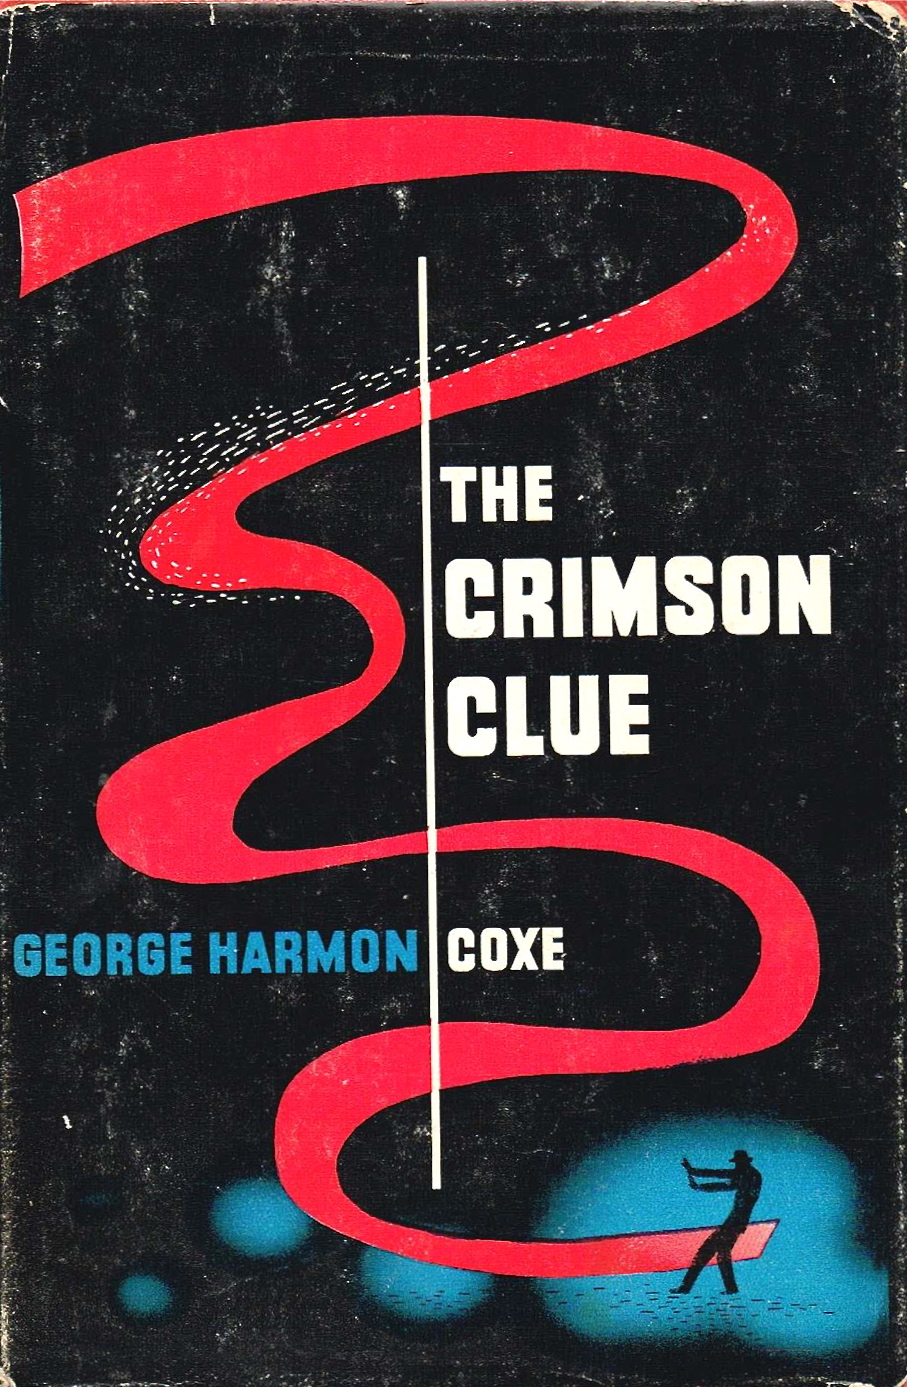 The Crimson Clue by George Harmon Coxe